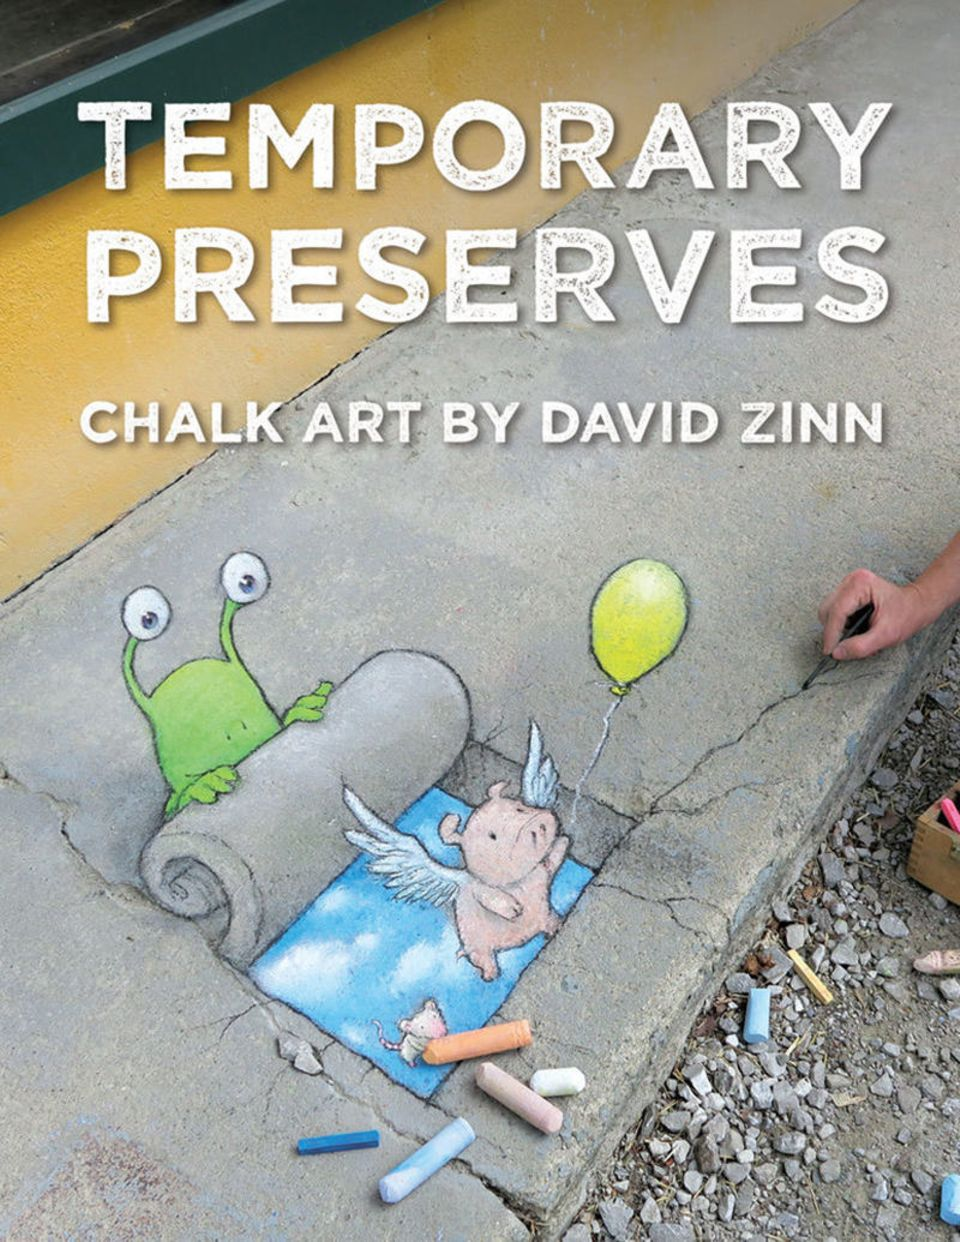 Temporaray Preservers Chalk Art by David Zinn